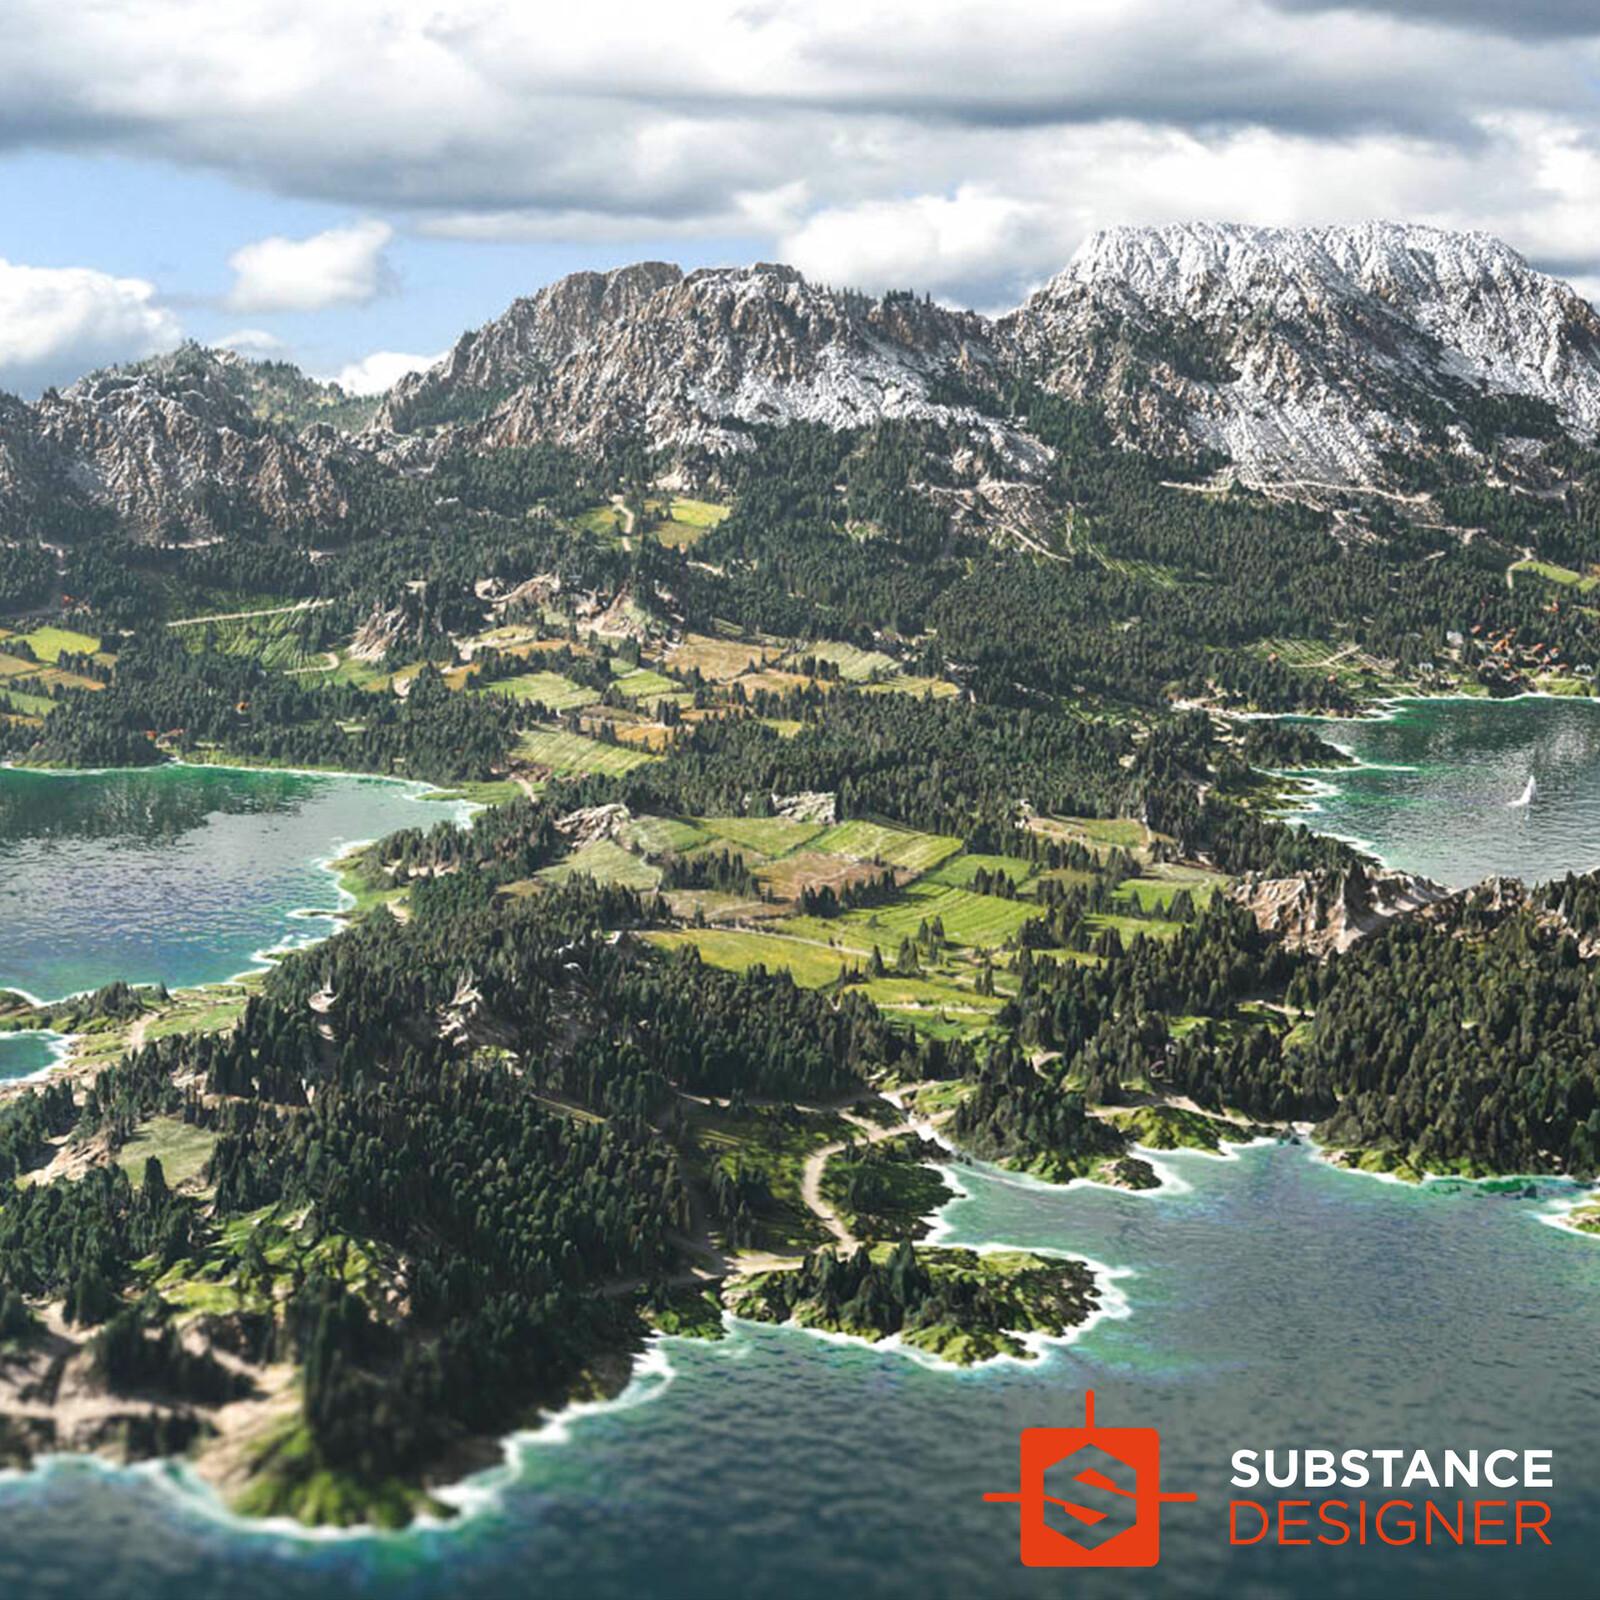 Alpine Material - 100% Substance Designer